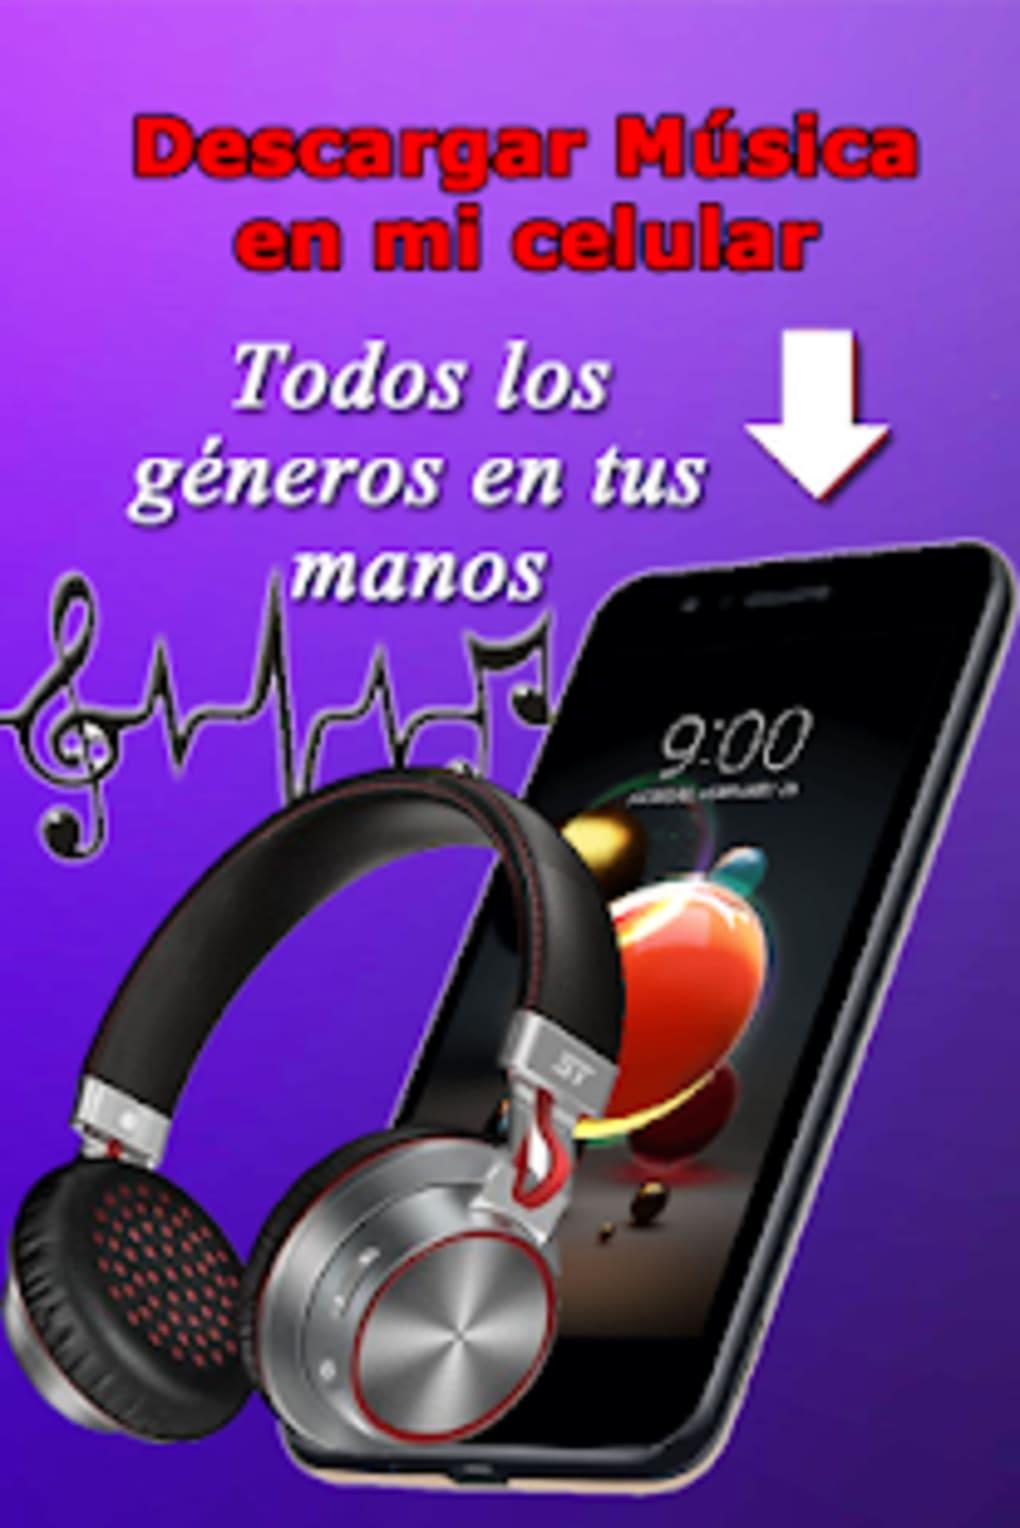 Programa Para Bajar Musica A Mi Celular - Compartir Celular